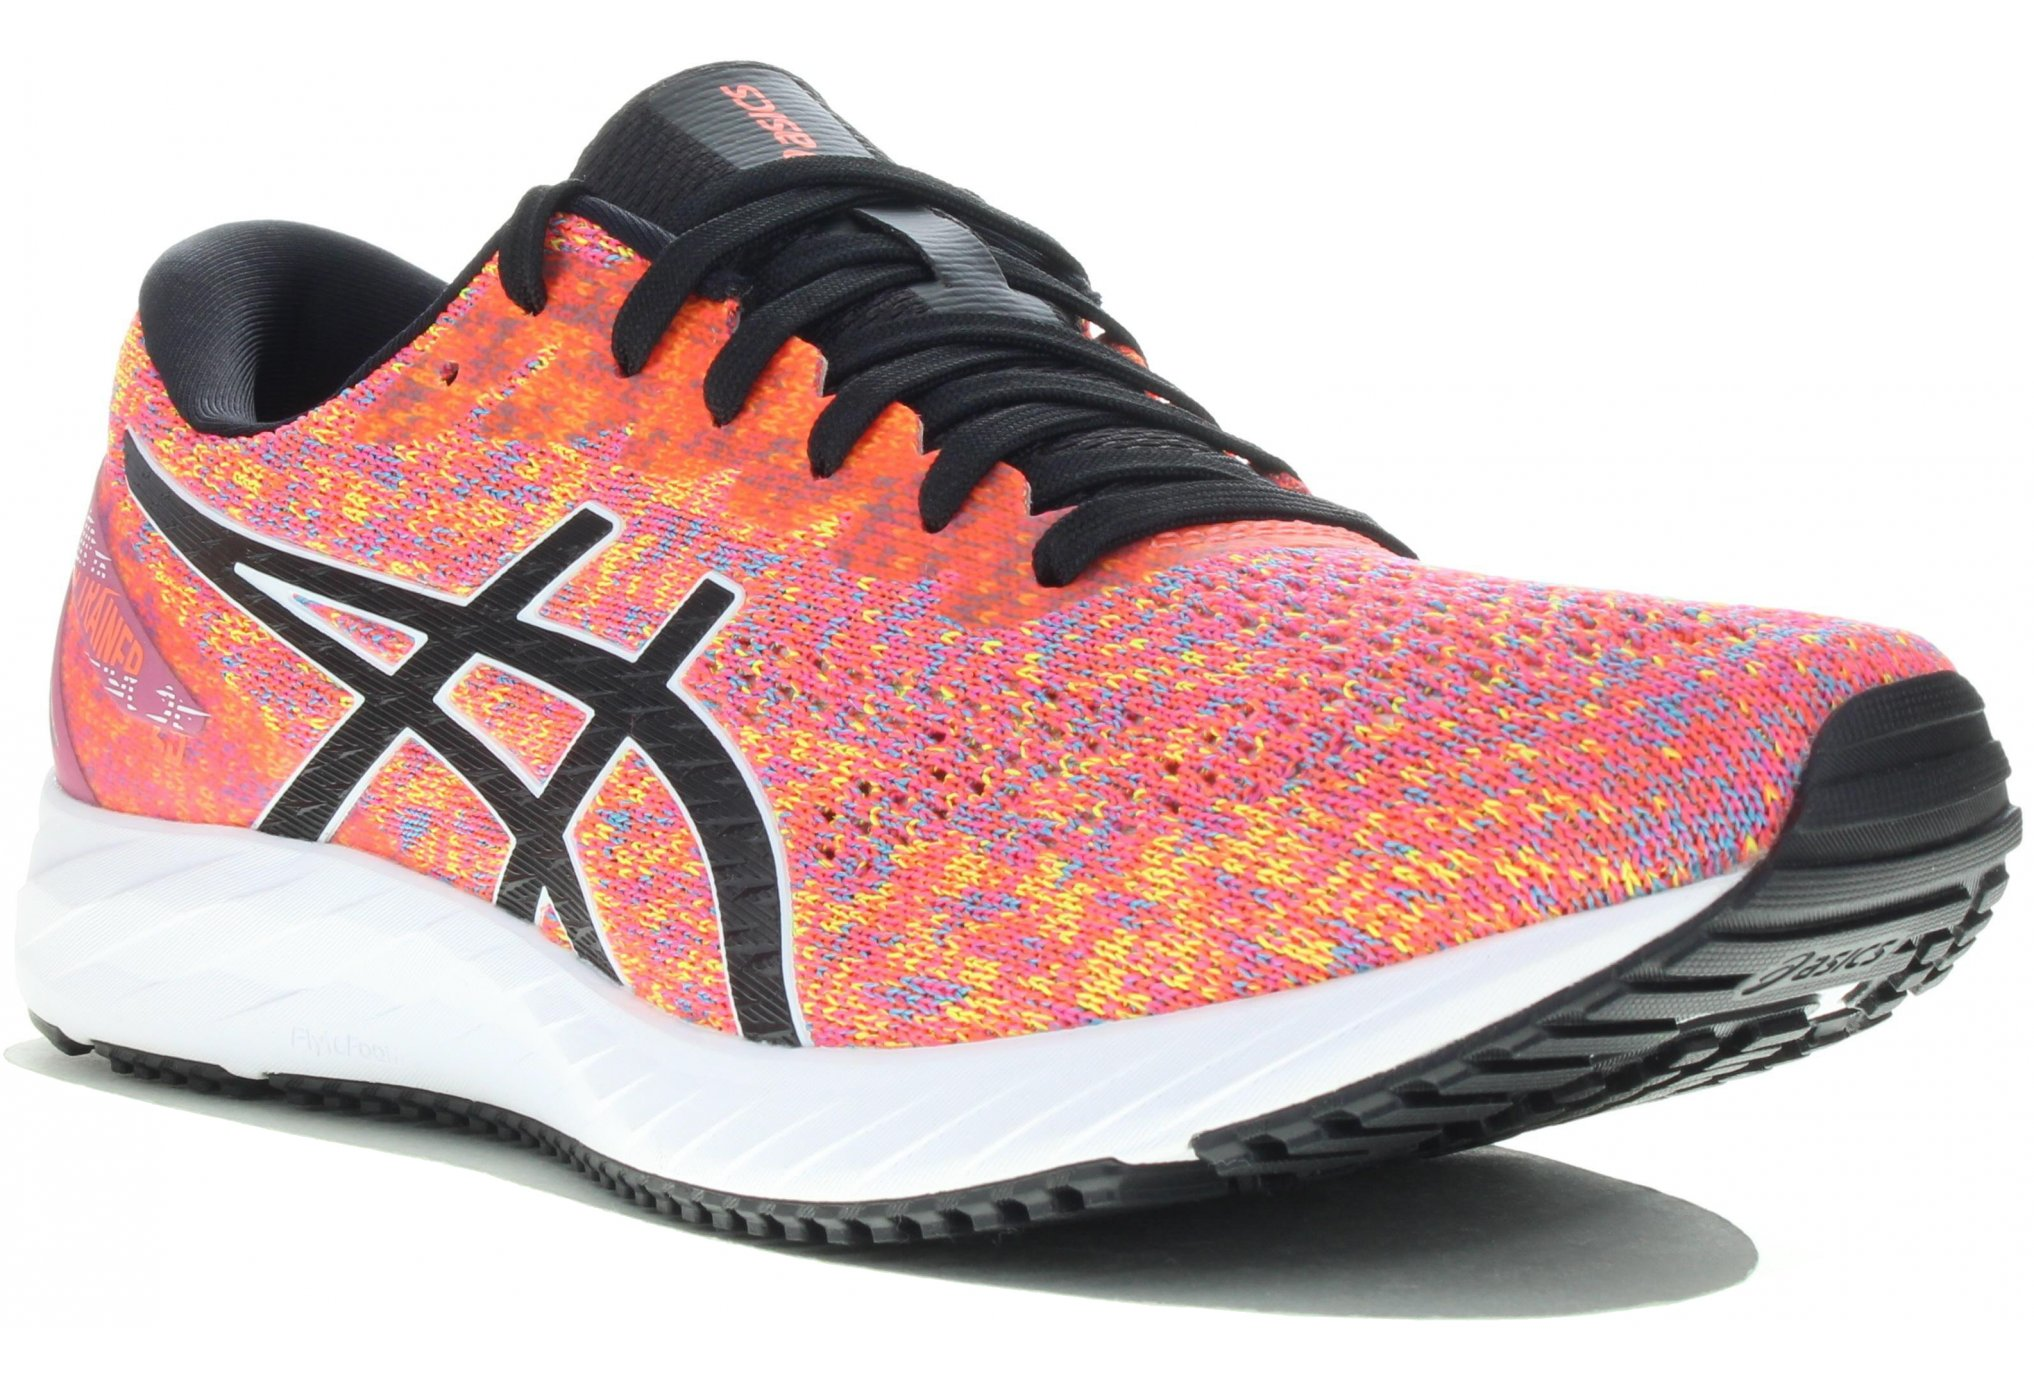 Asics Gel-DS Trainer 25 Chaussures running femme